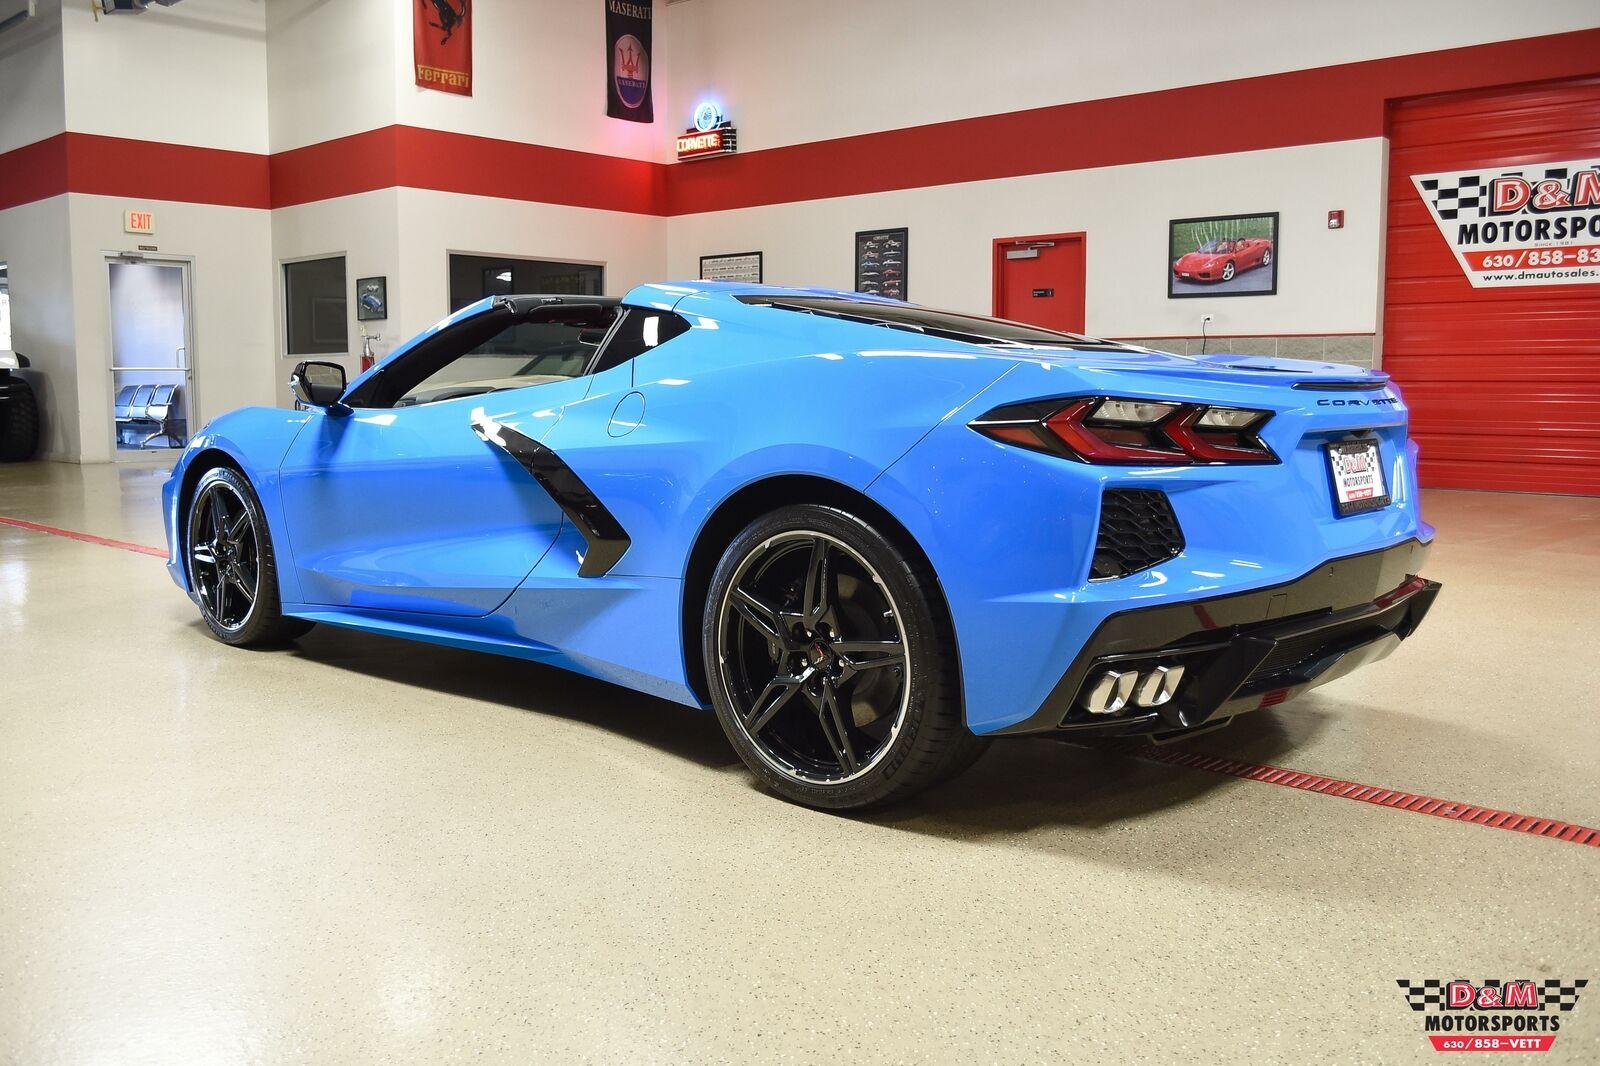 2020 Blue Chevrolet Corvette Stingray  | C7 Corvette Photo 3